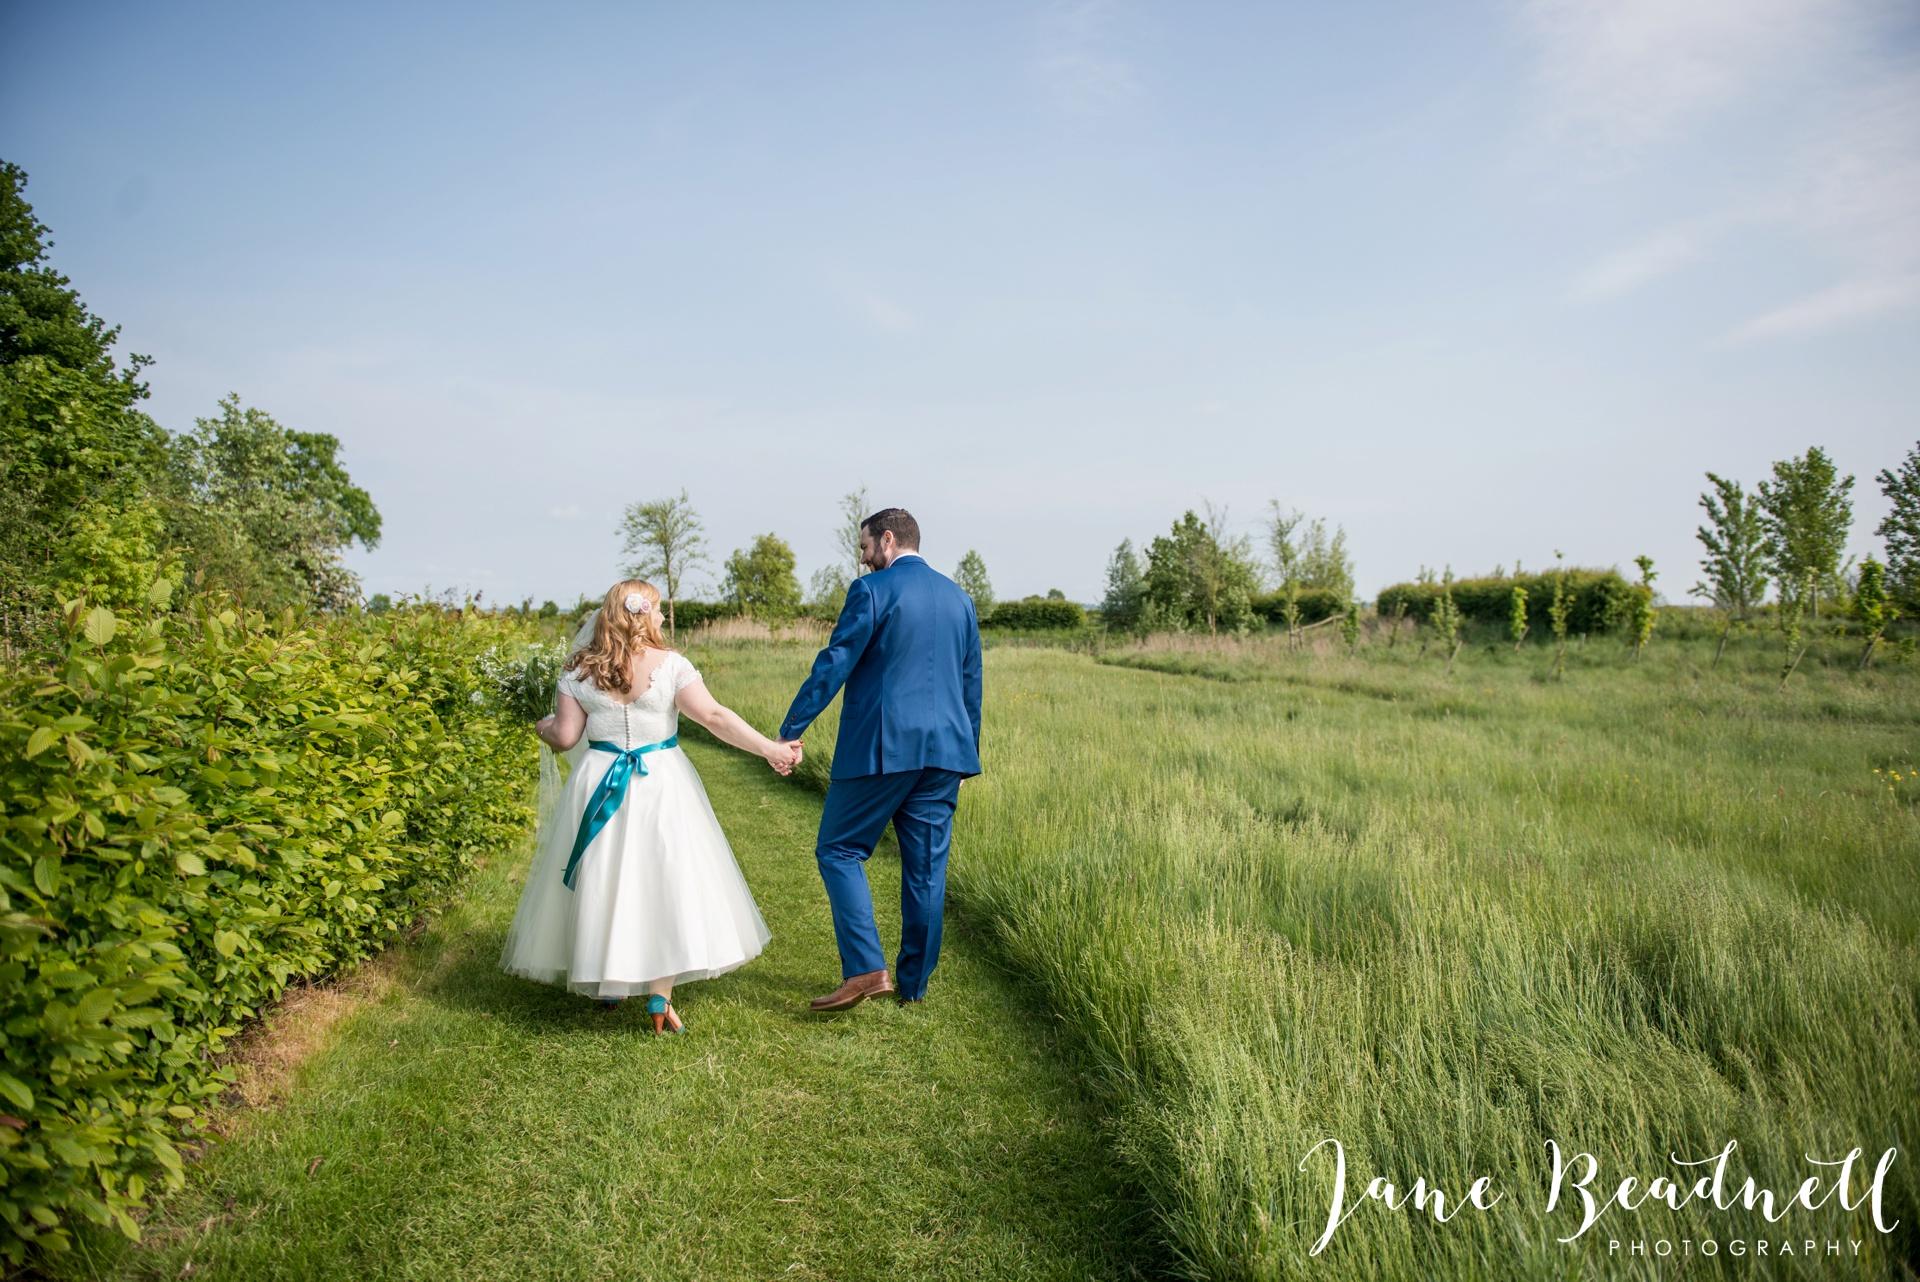 South Farm Wedding photography Hertfordshire by Jane Beadnell Photography fine art wedding photographer_0128